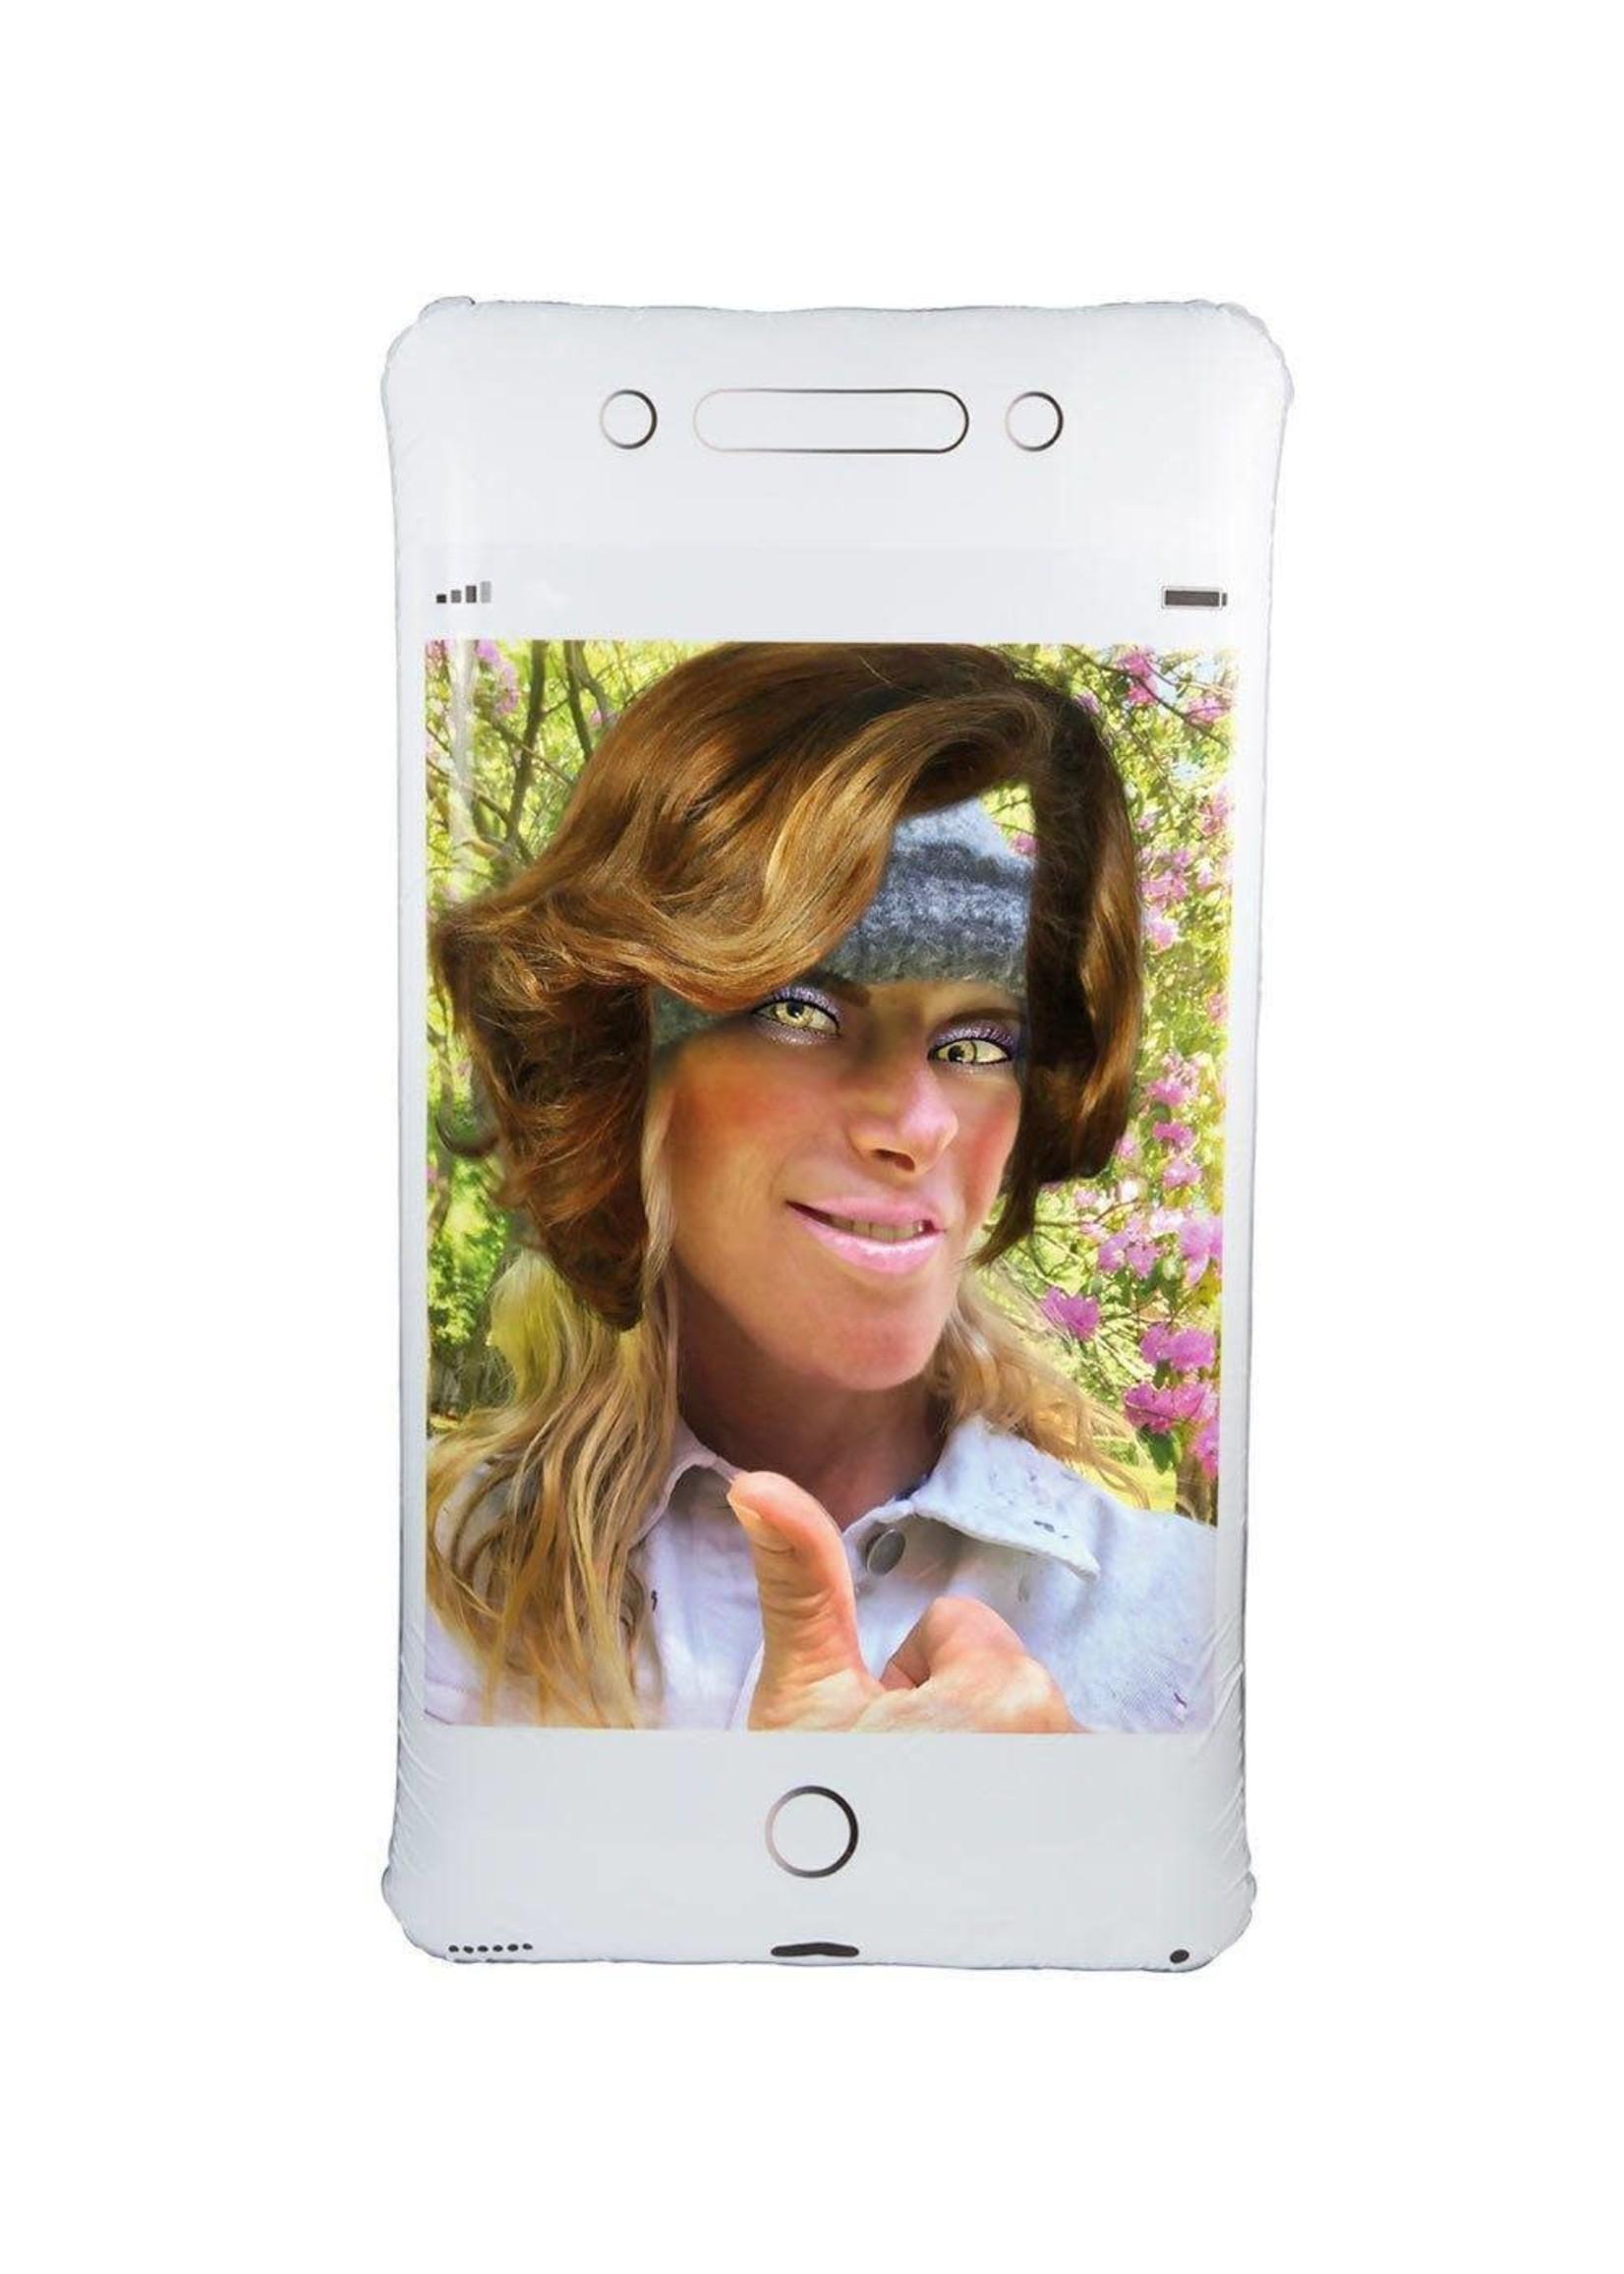 Cindy Sherman Cindy Sherman Insta Selfie Pool Float